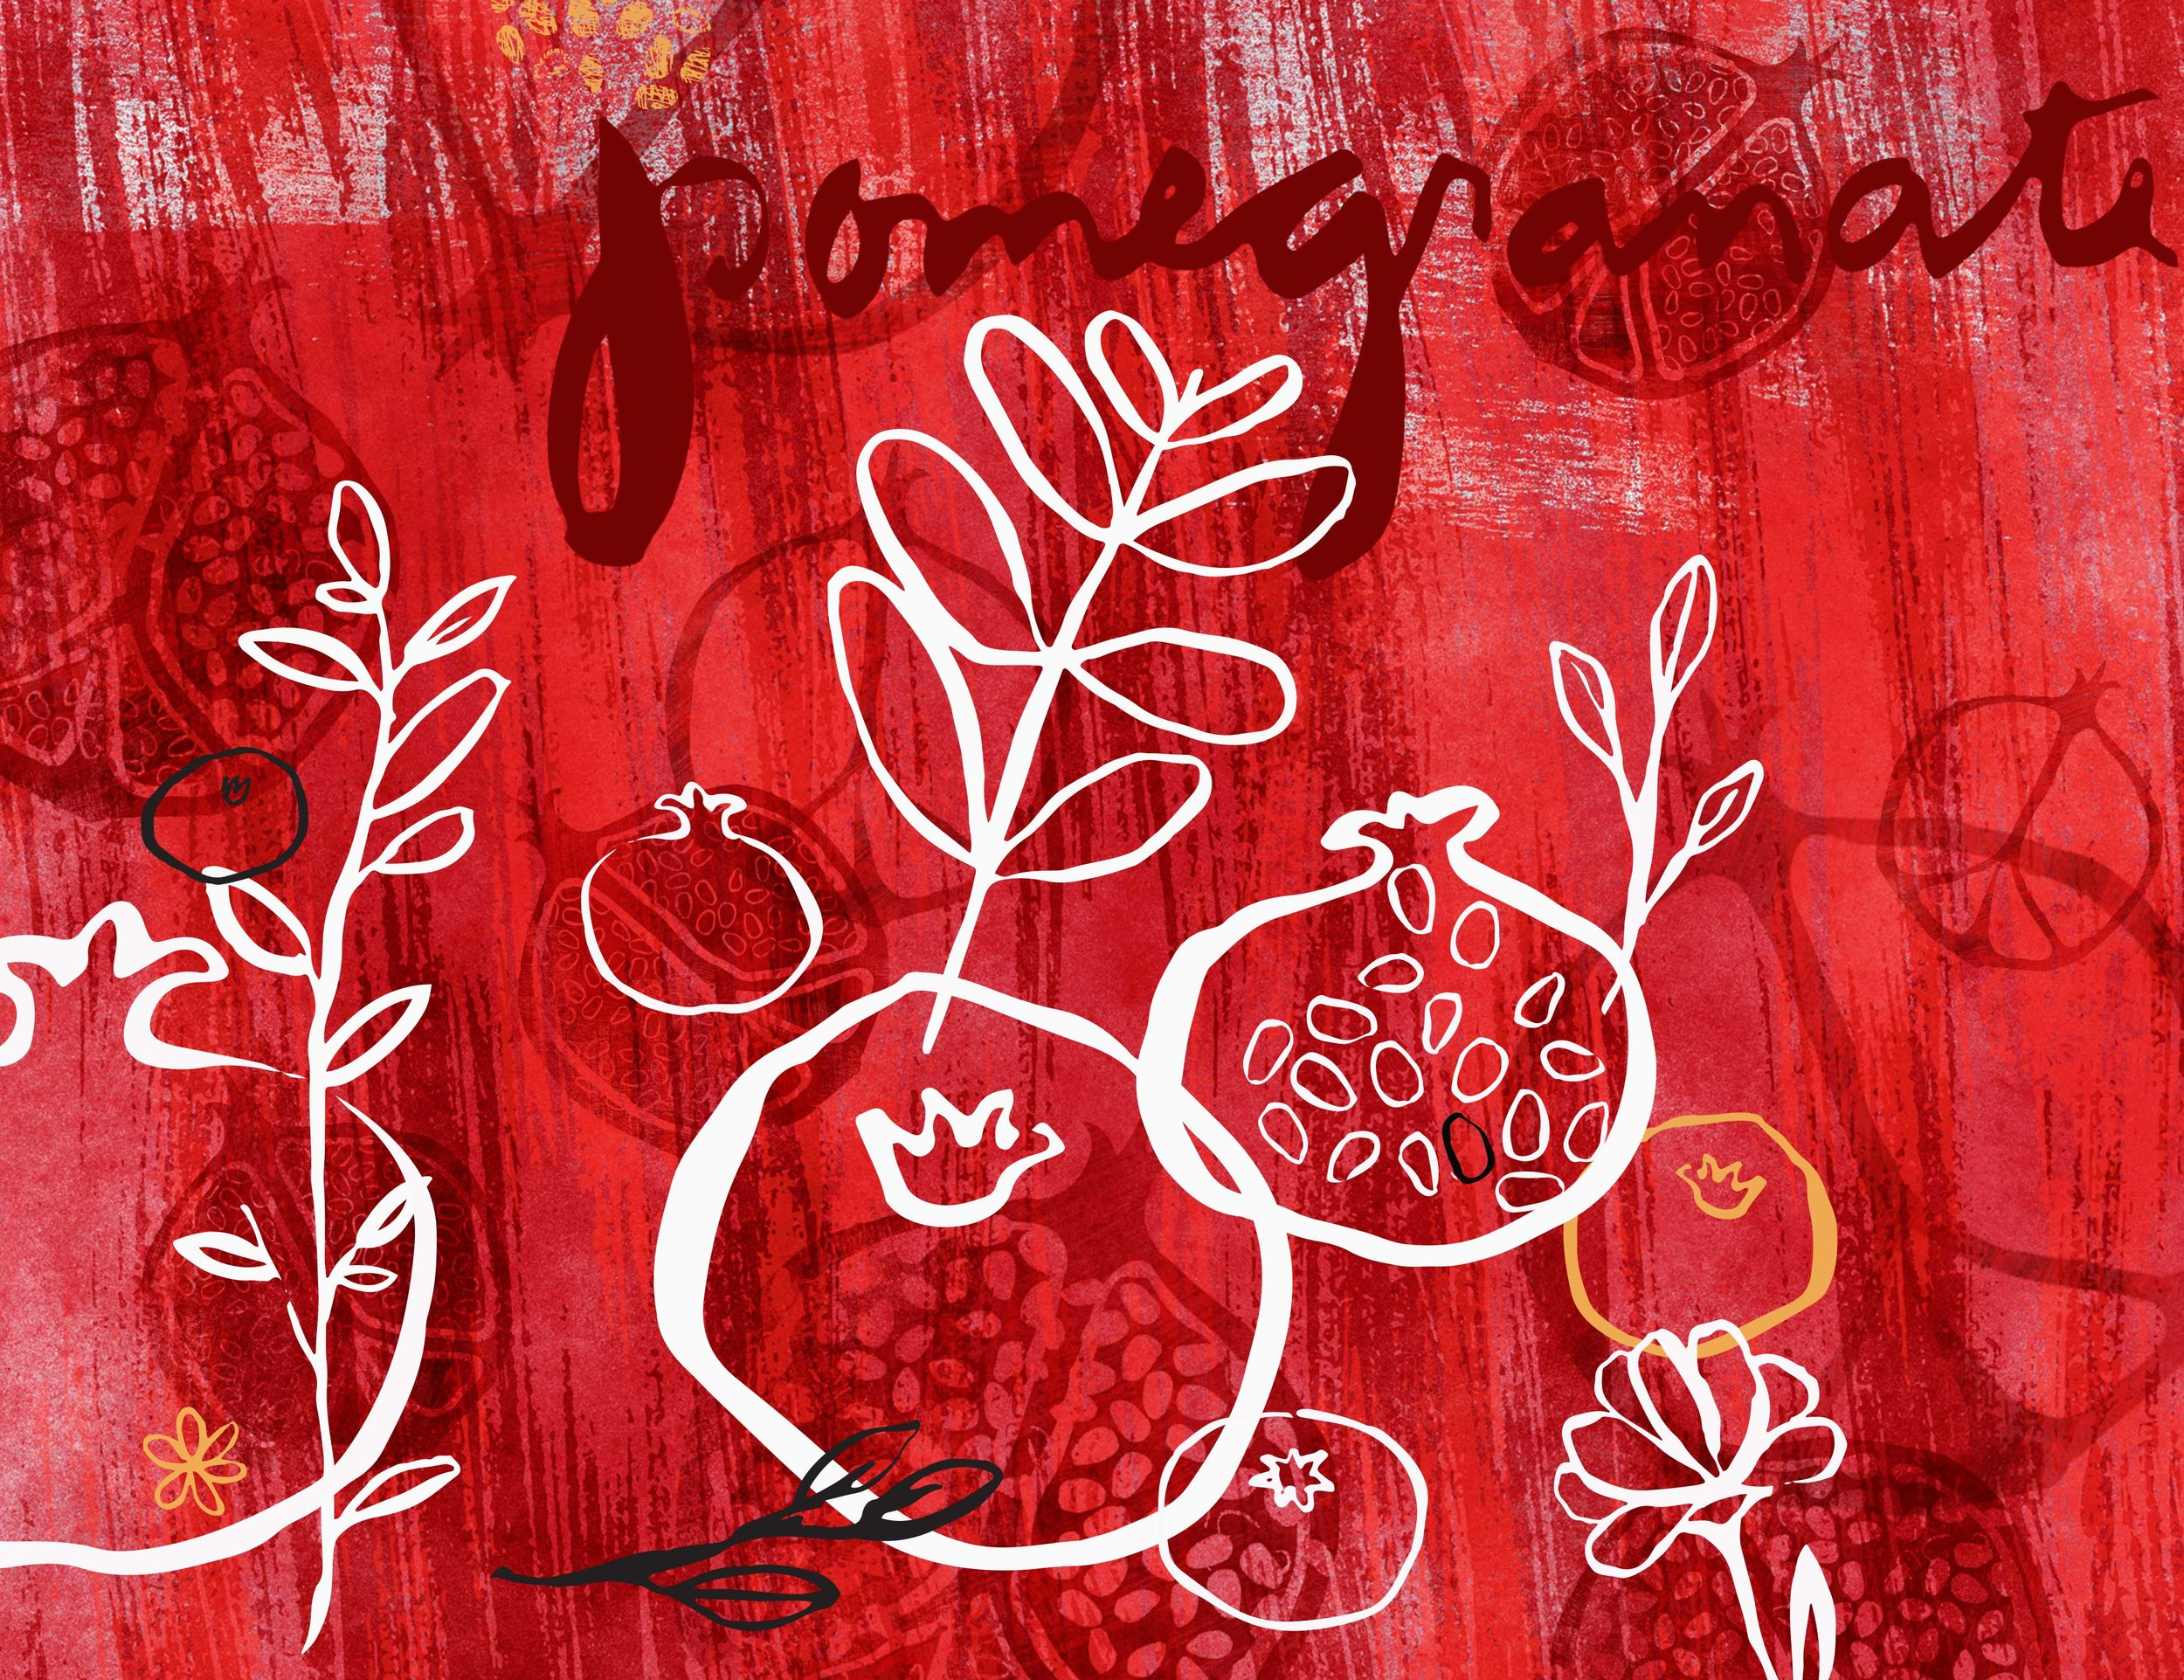 pomegranate1d.jpg